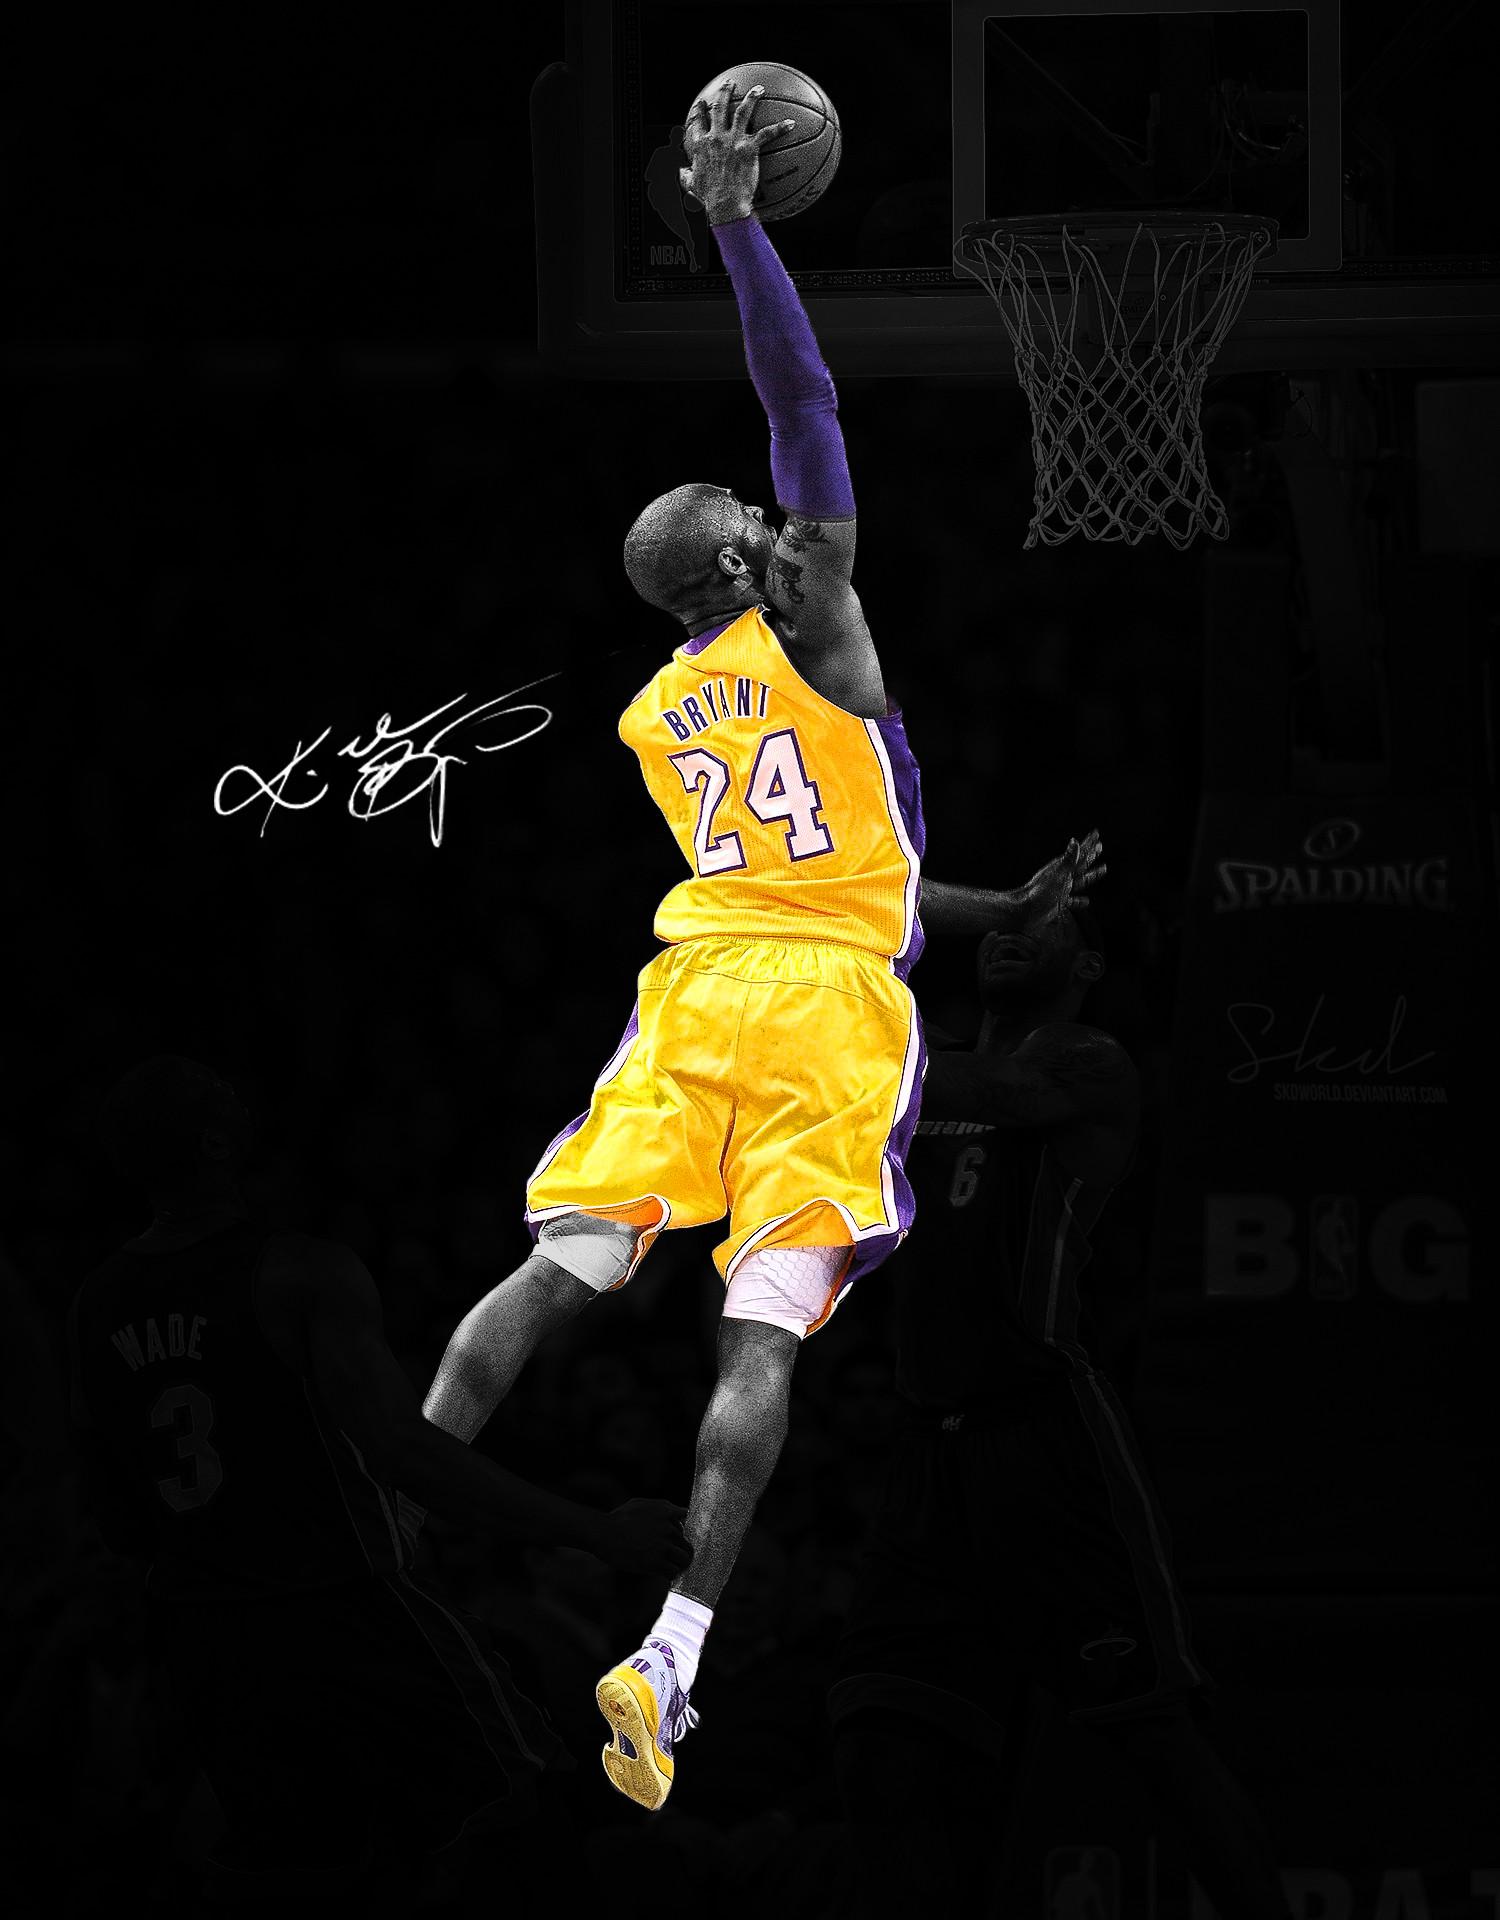 Kobe Bryant Dunk On Lebron James Wallpapers Hd Resolution - Fond D Écran Kobe Bryant Dunk - HD Wallpaper